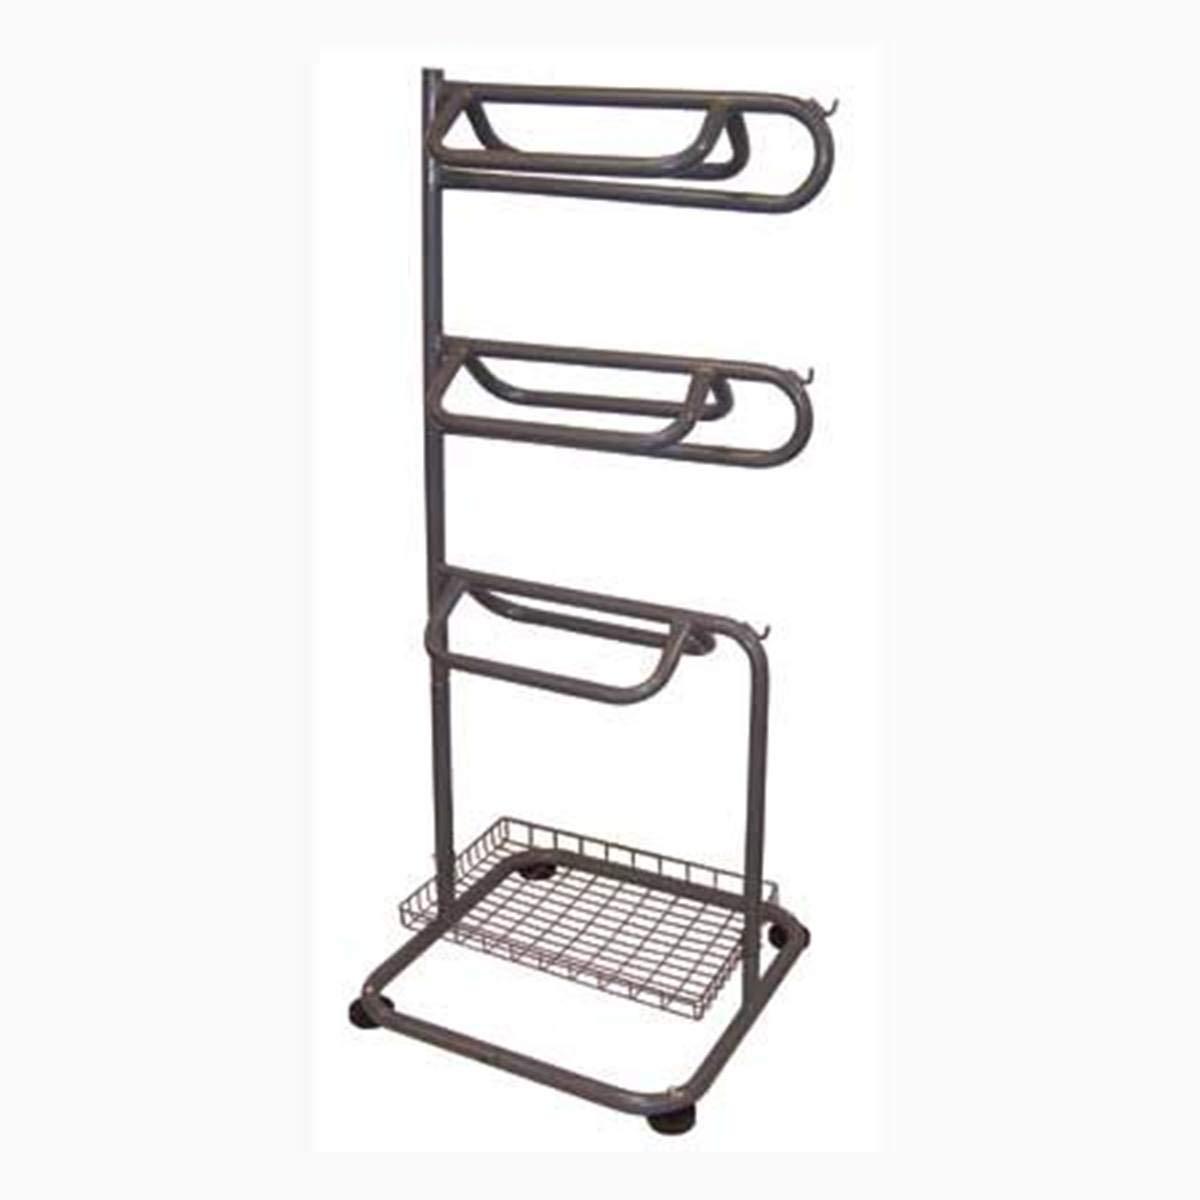 DDI Saddle Rack 3 Tier Steel Construction Gray Top 2 Racks Swivels